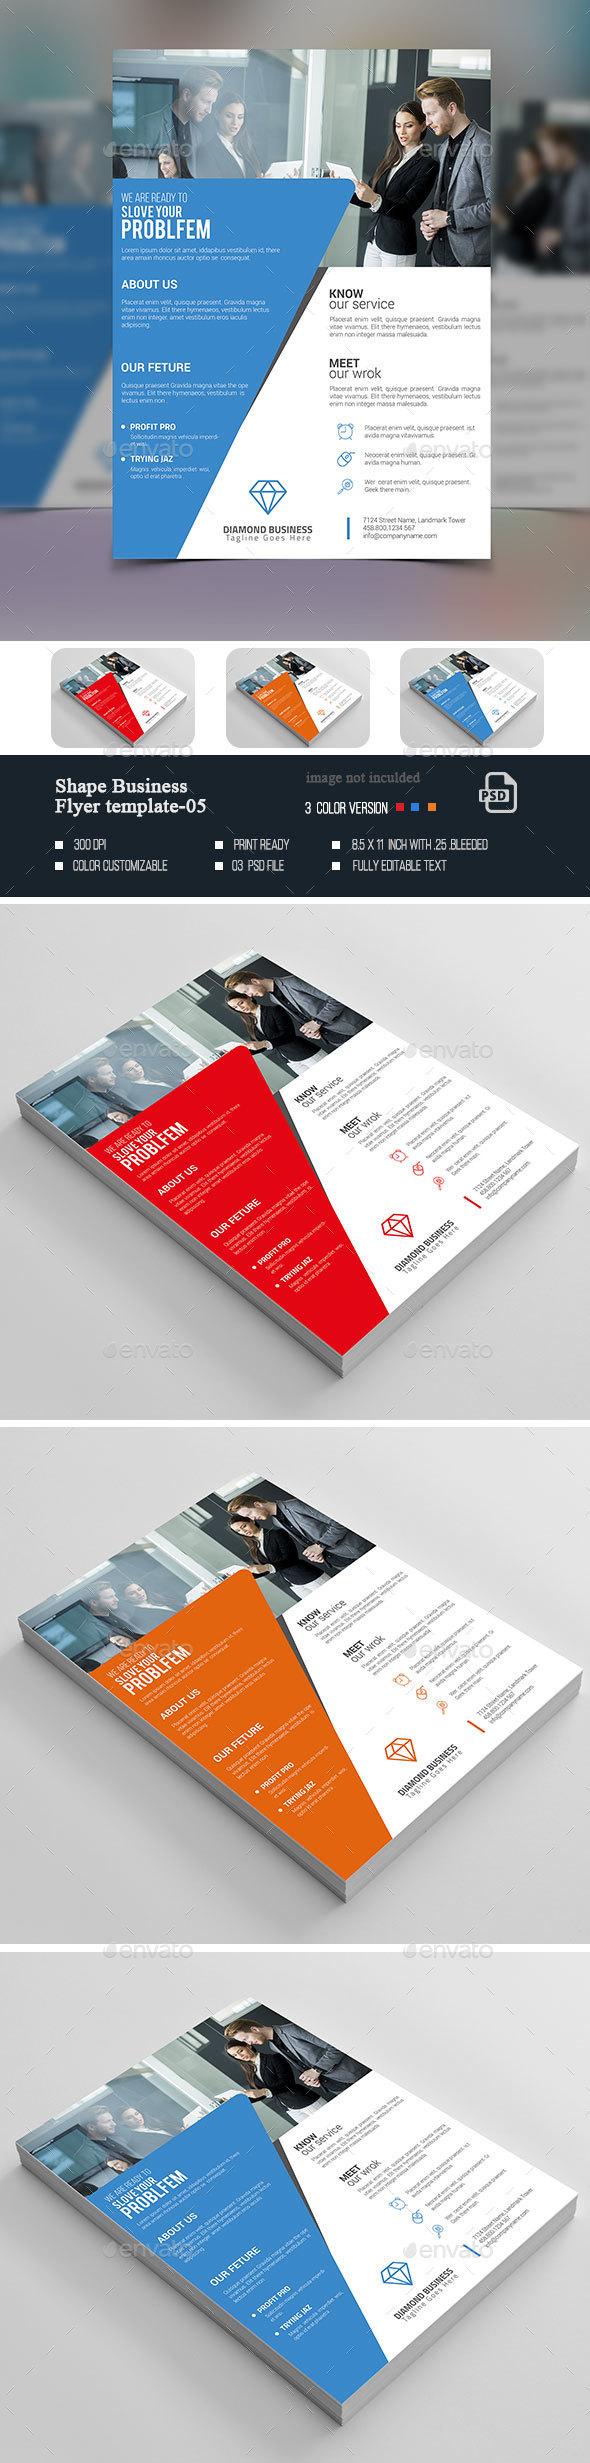 Shape Business Flyer-05 - Corporate Flyers